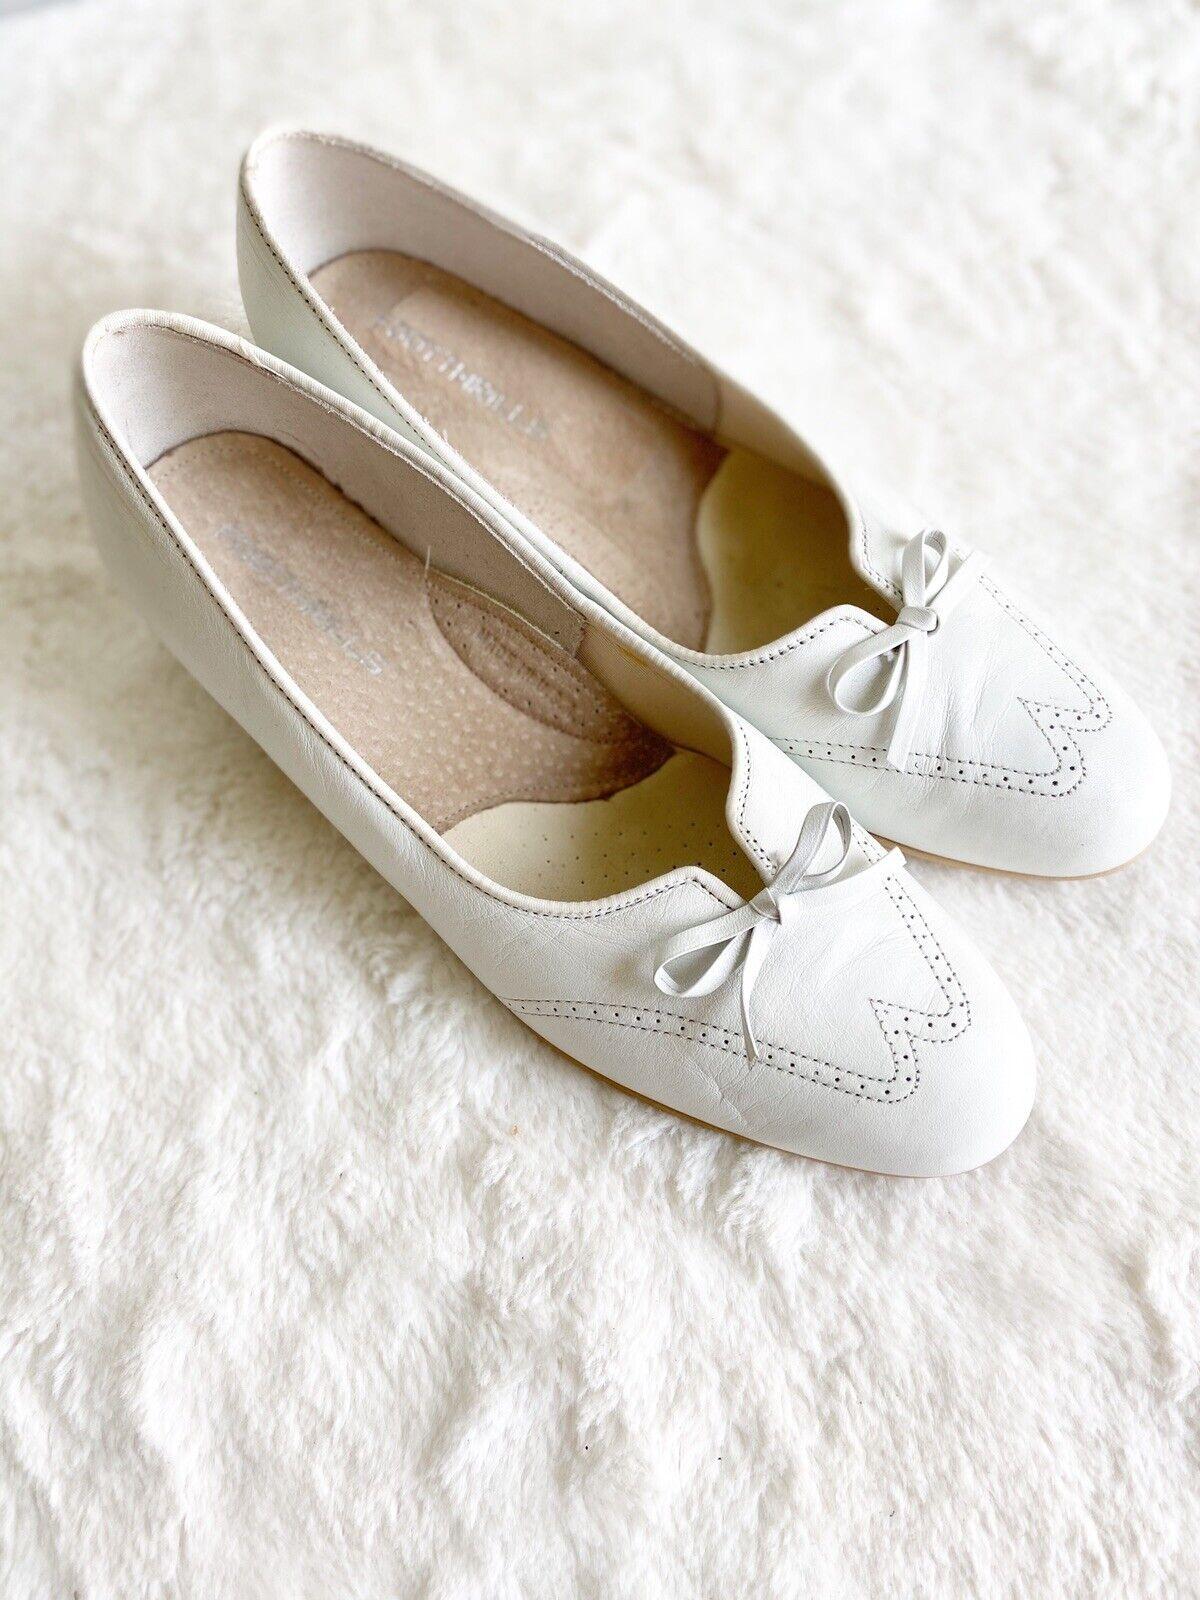 Footthrills Women's White Leather Shoes Pump Heel Wingtip Granny Victorian Sz8